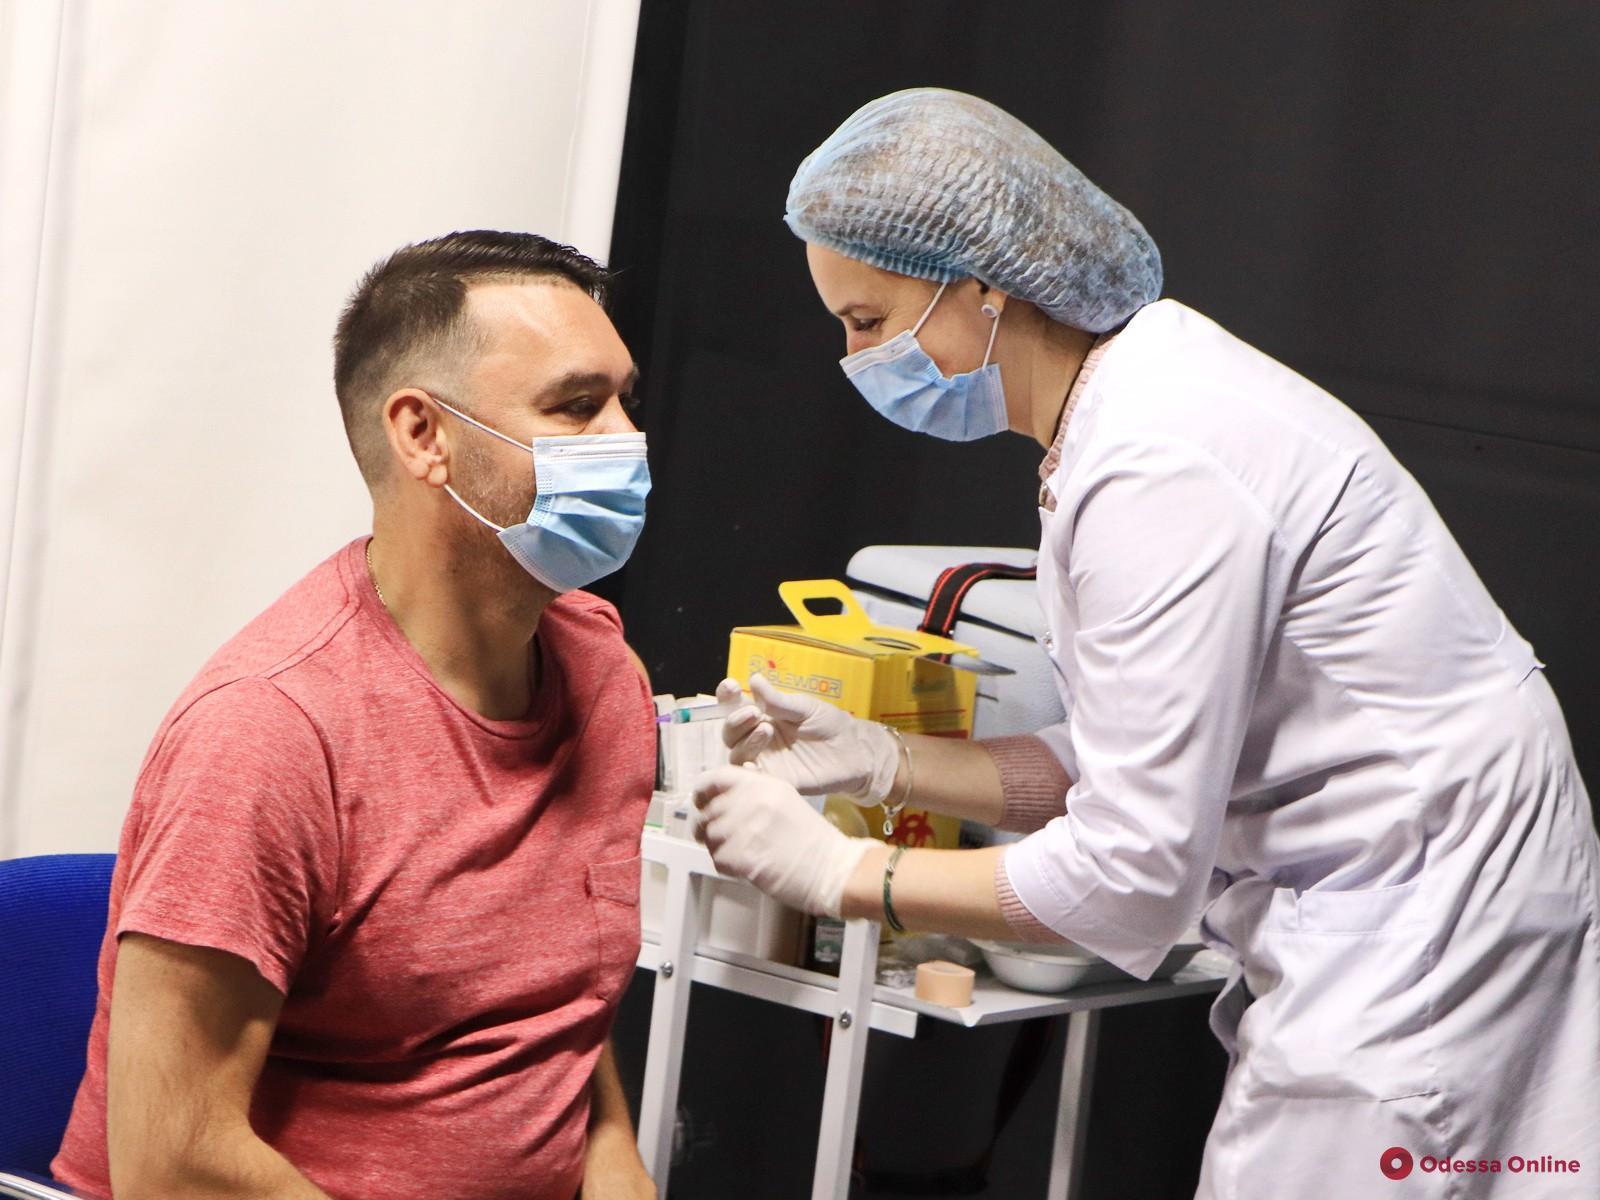 За день более 1300 одесситов получили прививки от COVID-19 в центрах массовой вакцинации